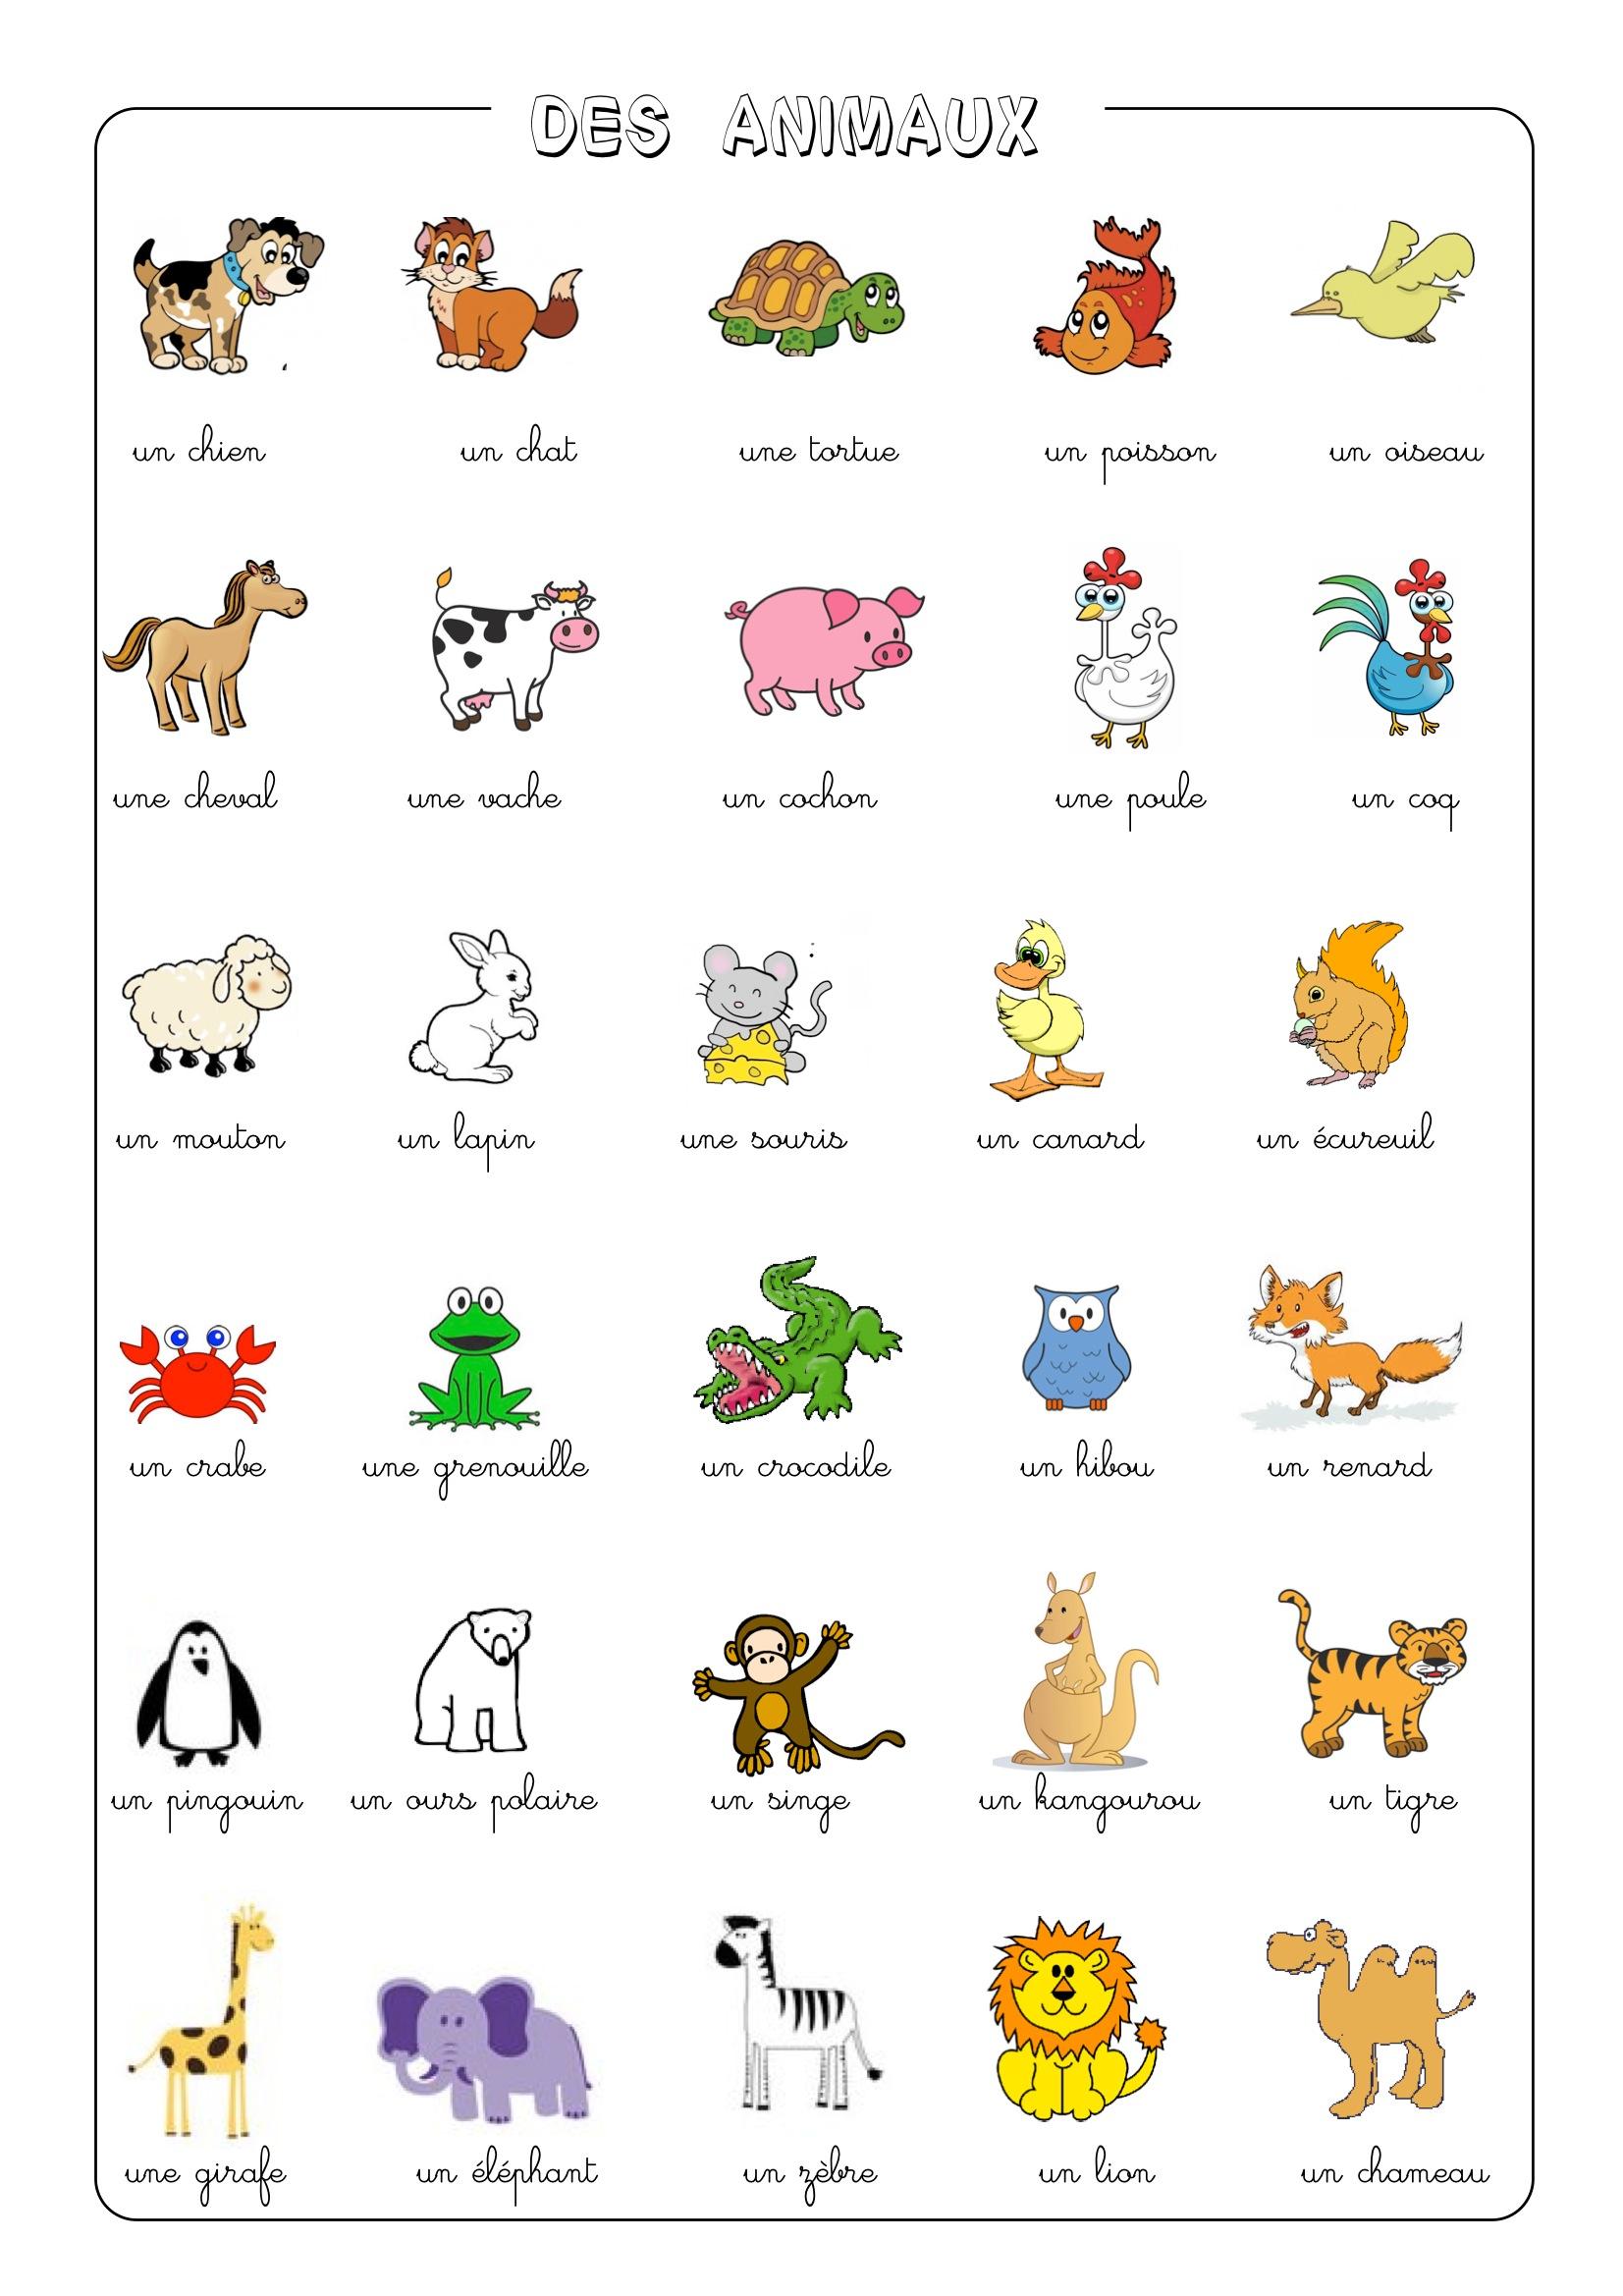 Extraordinaire Liste Des Animaux En Anglais VJ41 | Montrealeast TS96